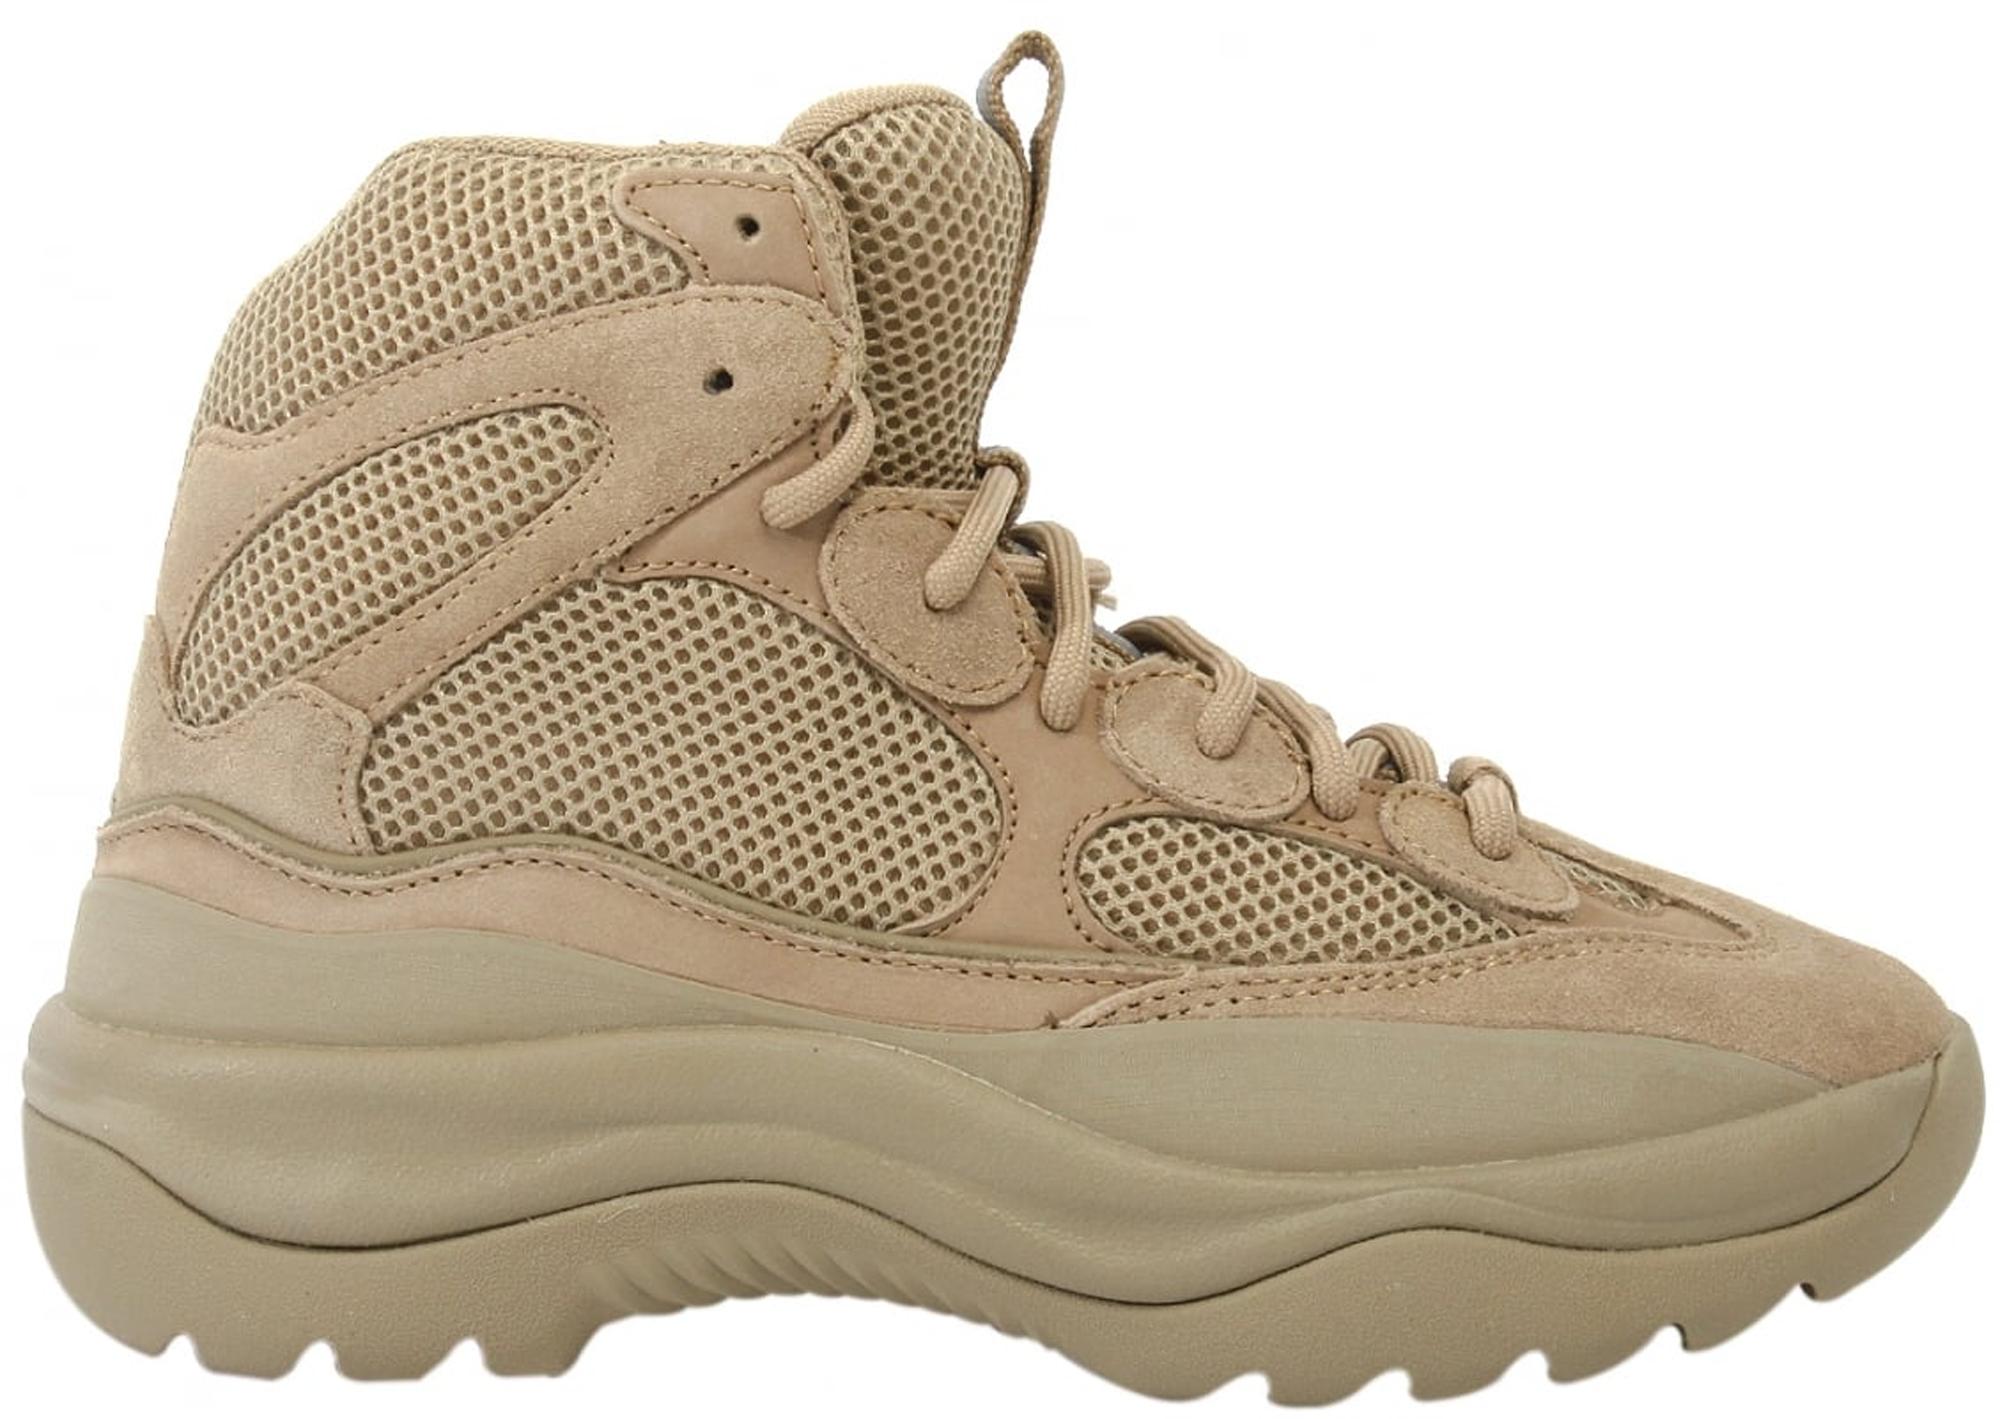 Yeezy Suede Desert Boot Season 6 Taupe